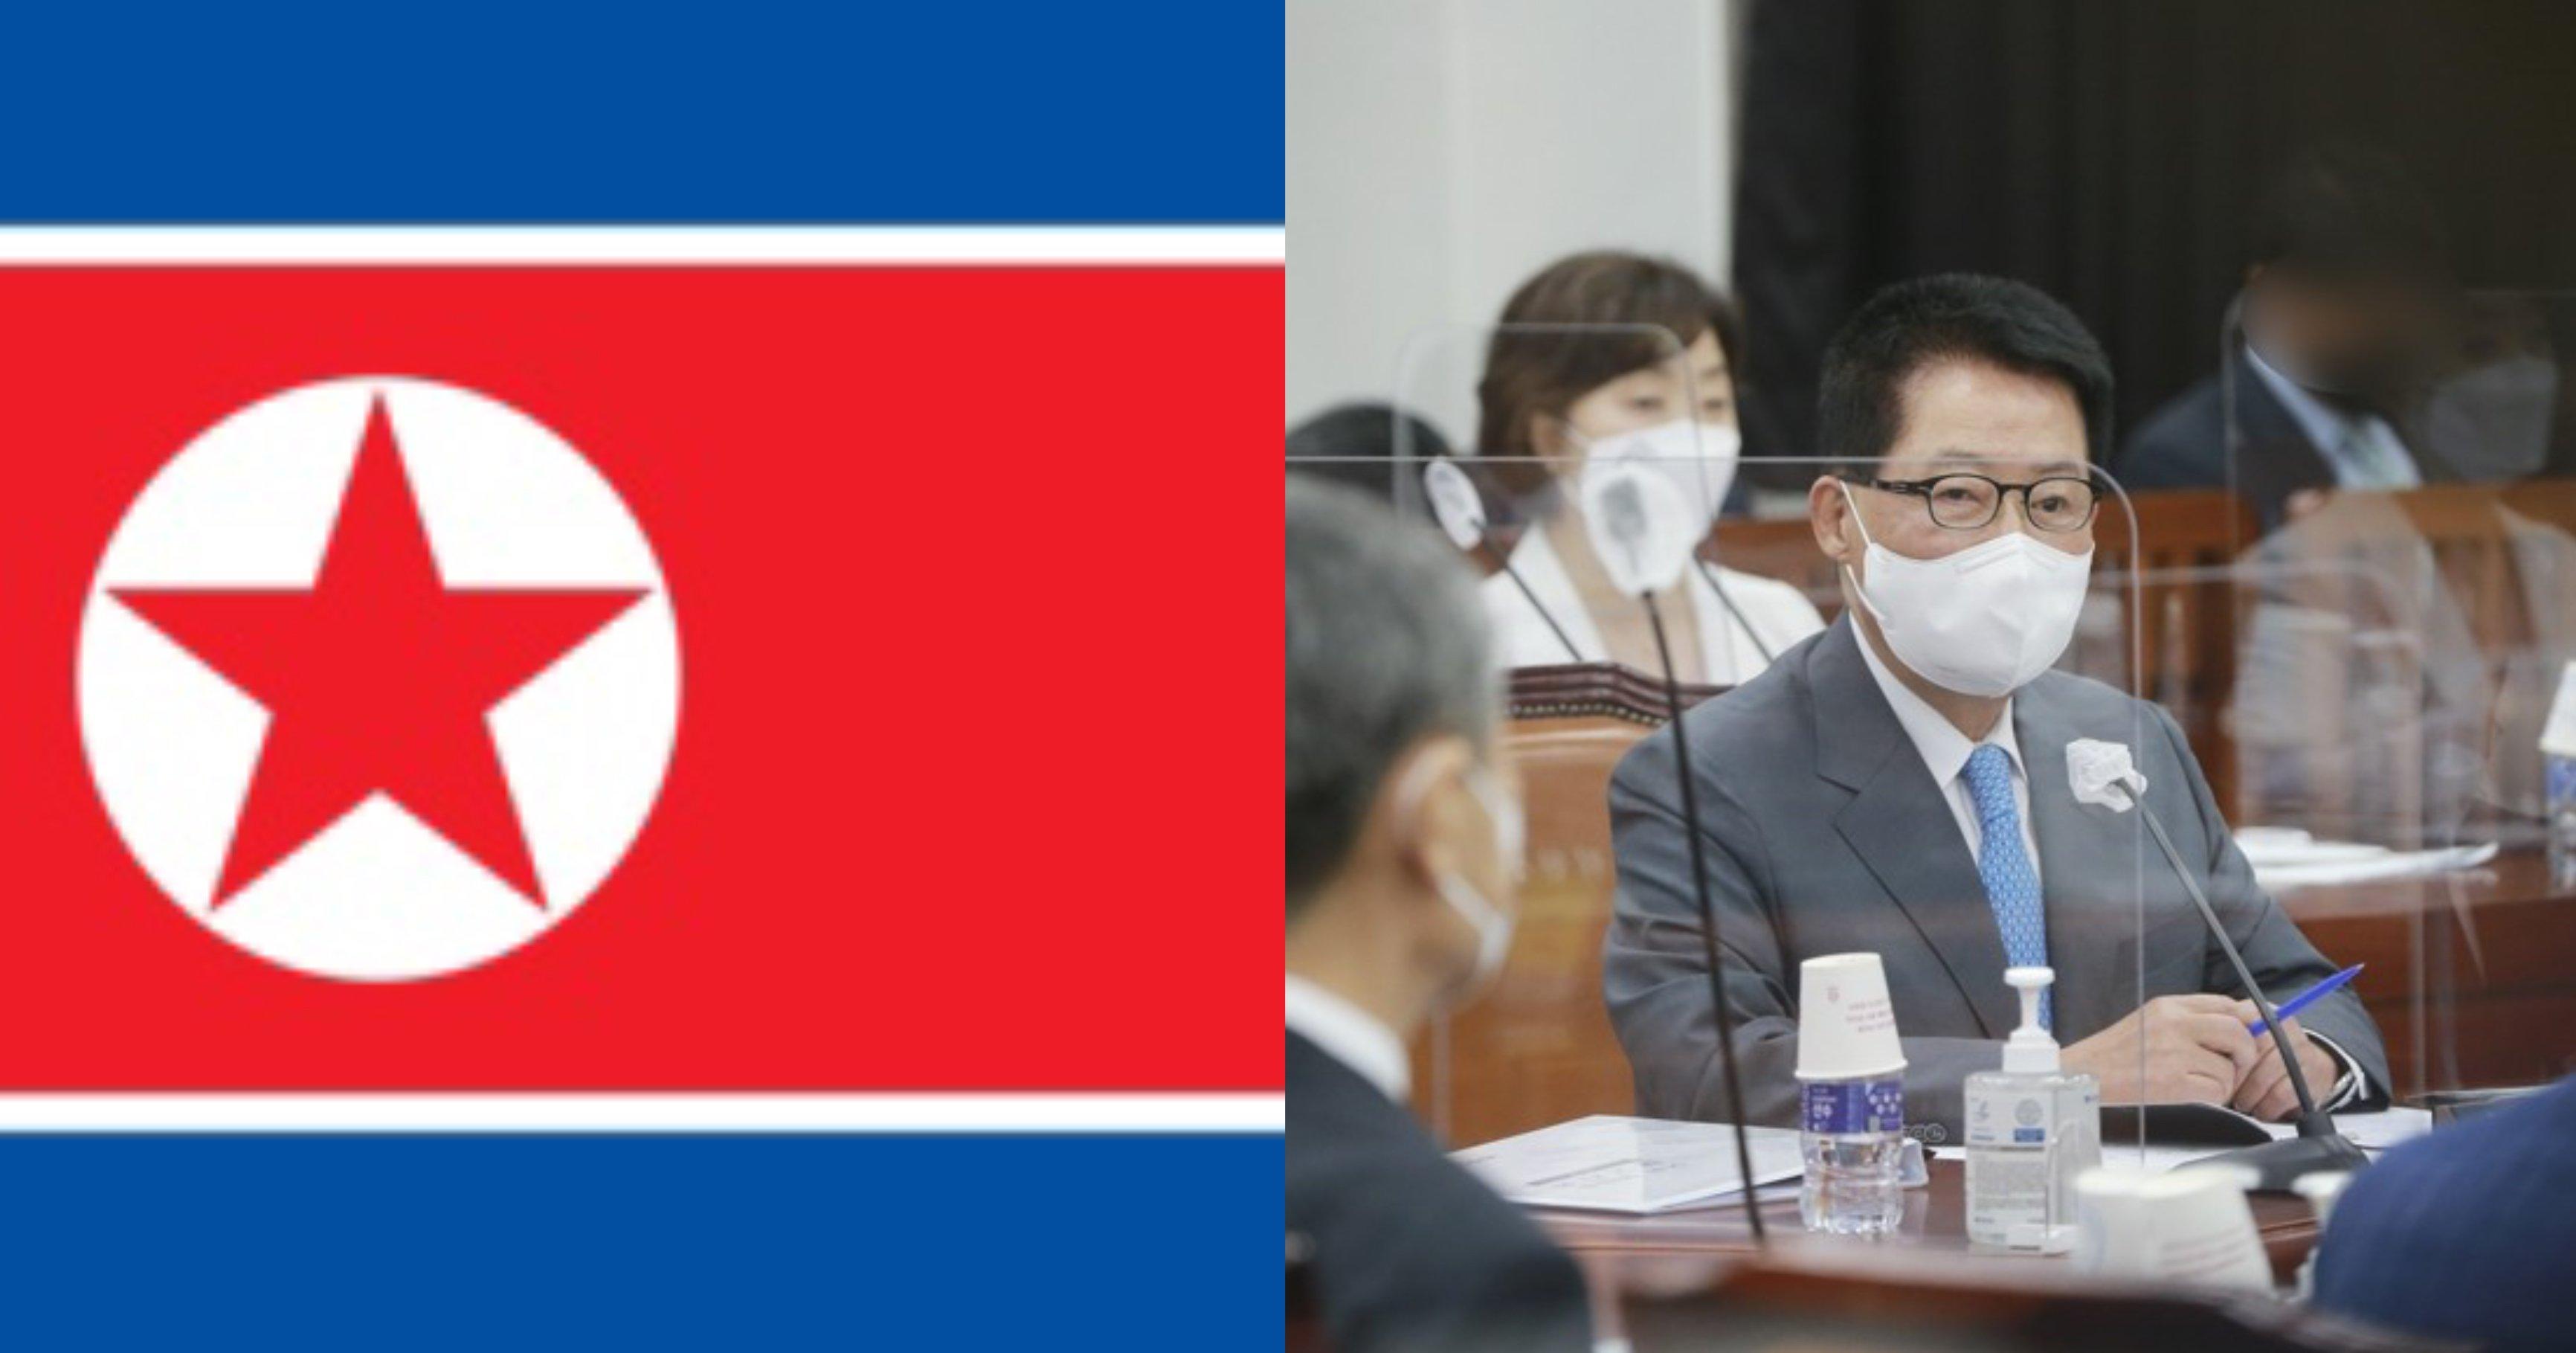 img 00012225822f 1.jpeg?resize=1200,630 - [속보] 한국 원자력 연구소 '북한'해킹에 12일간 노출 당했다